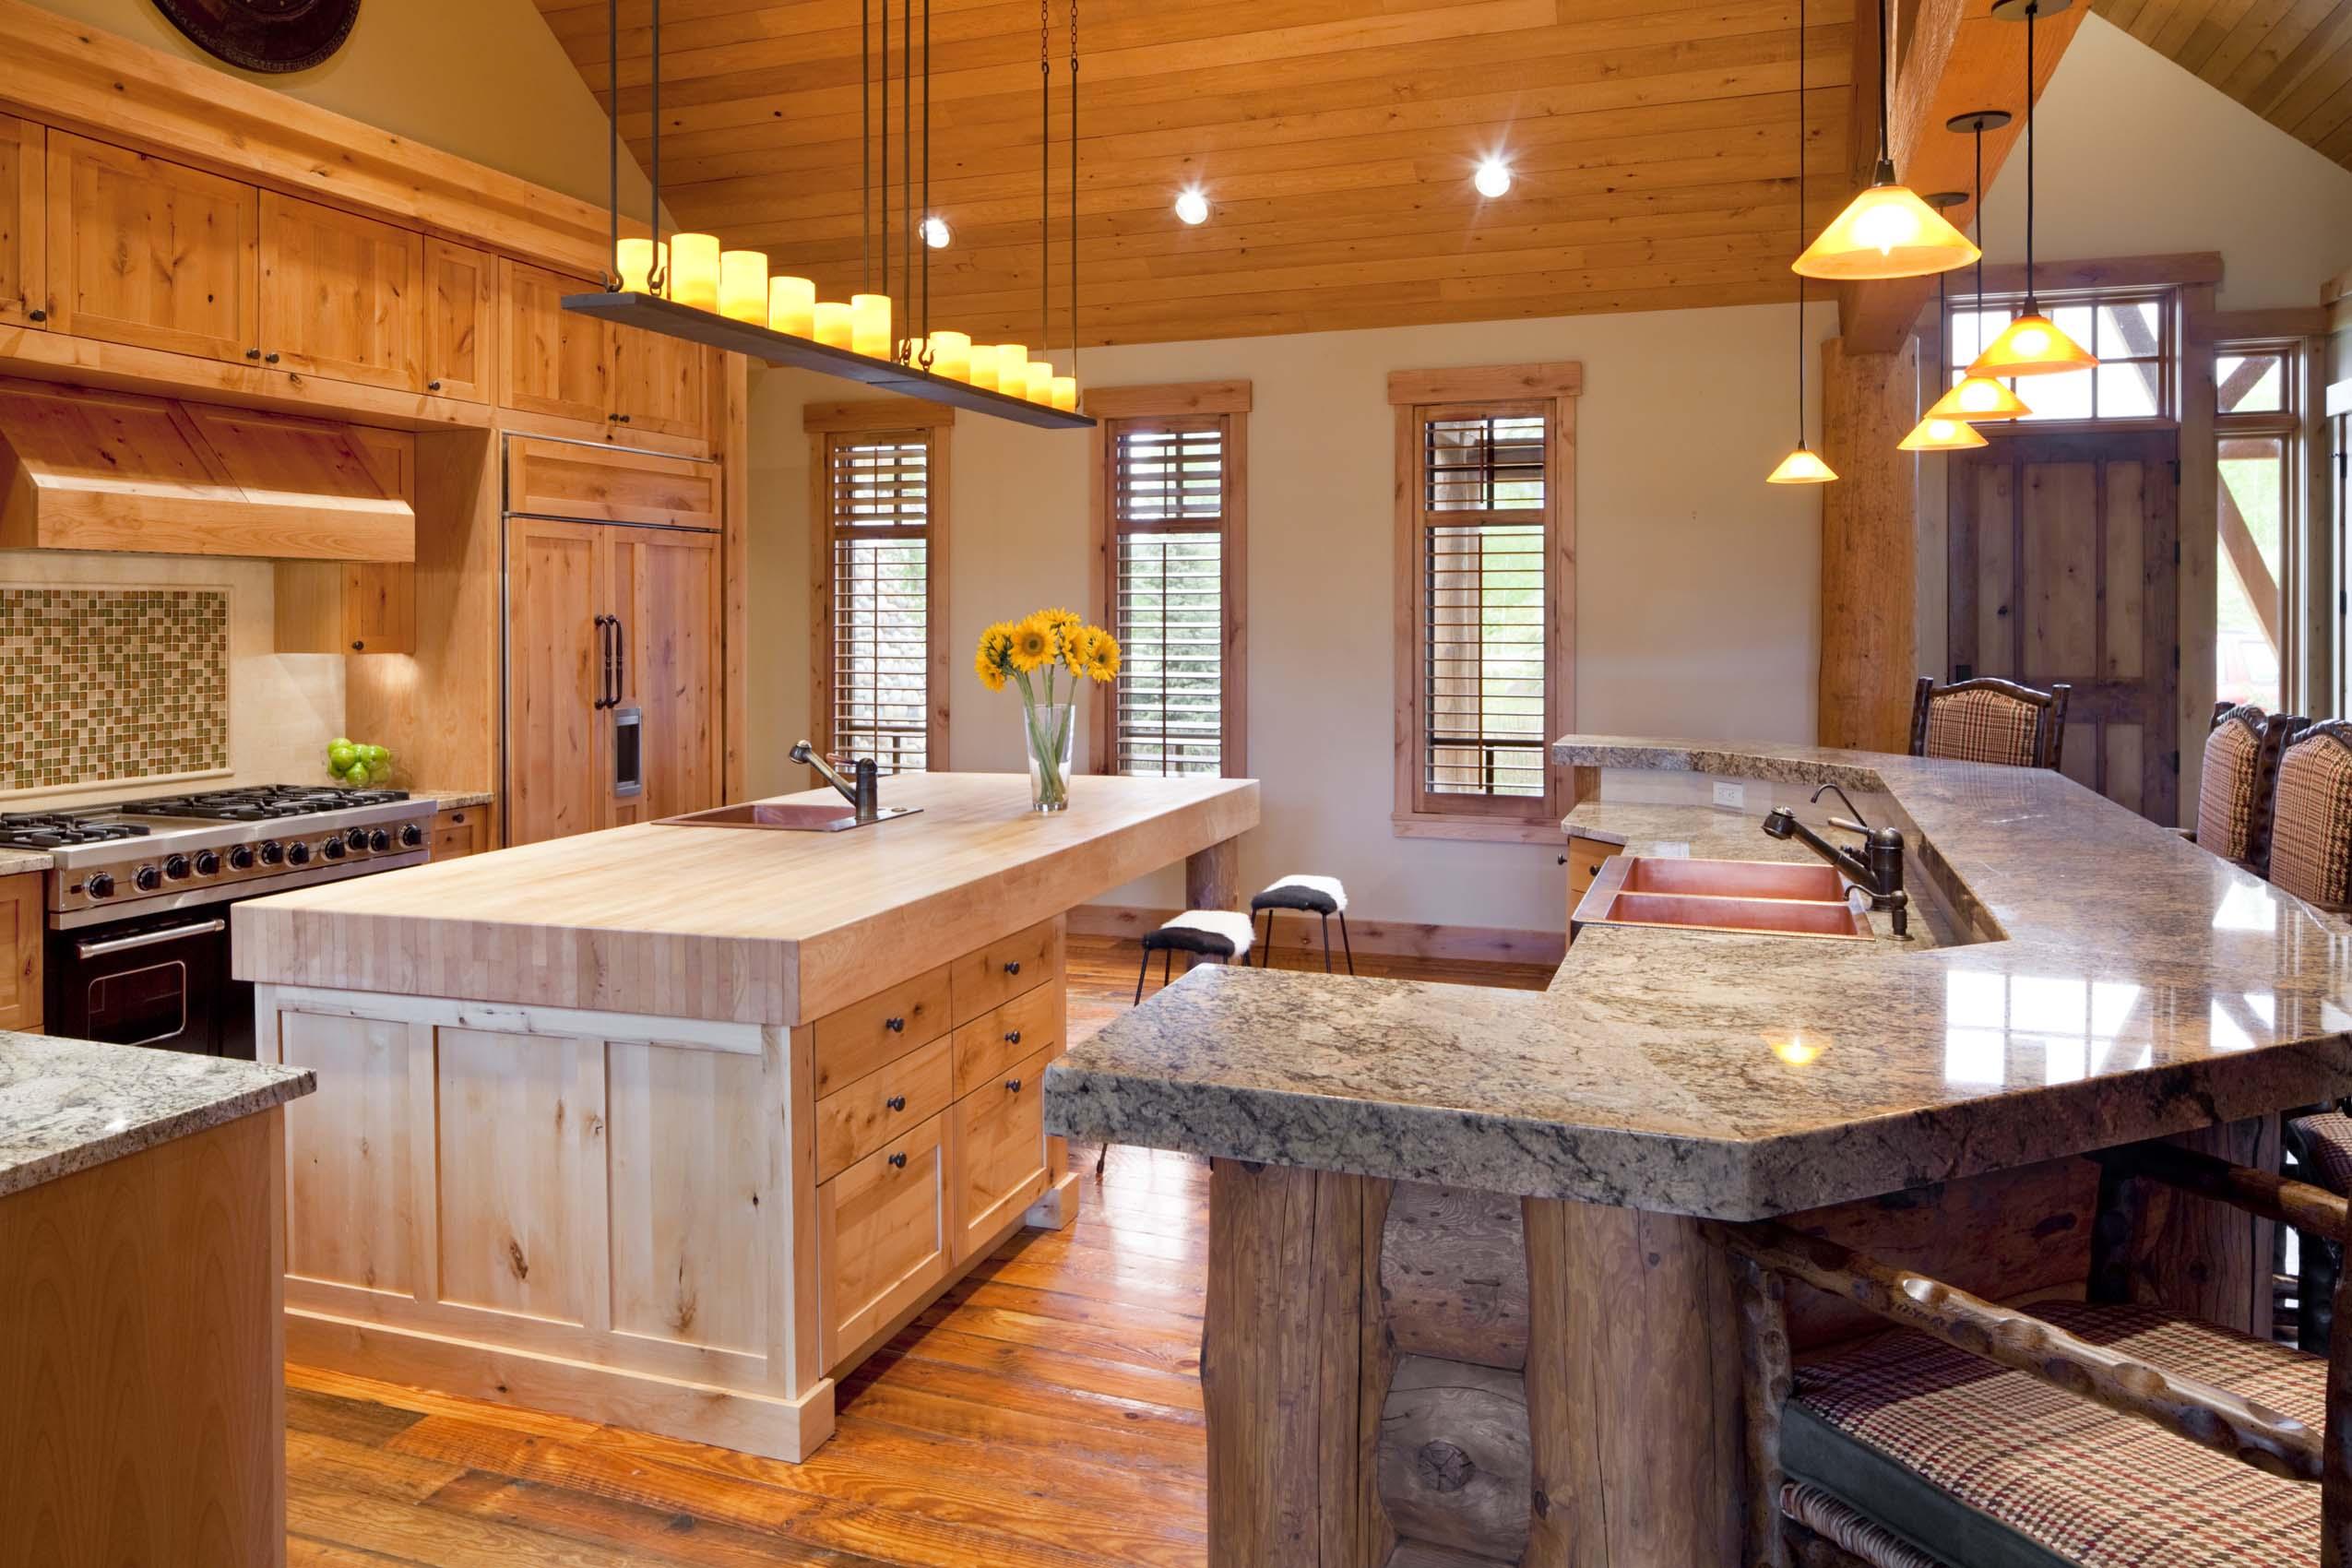 Aspen-area Mountain Estate Sold for $3.3 Million